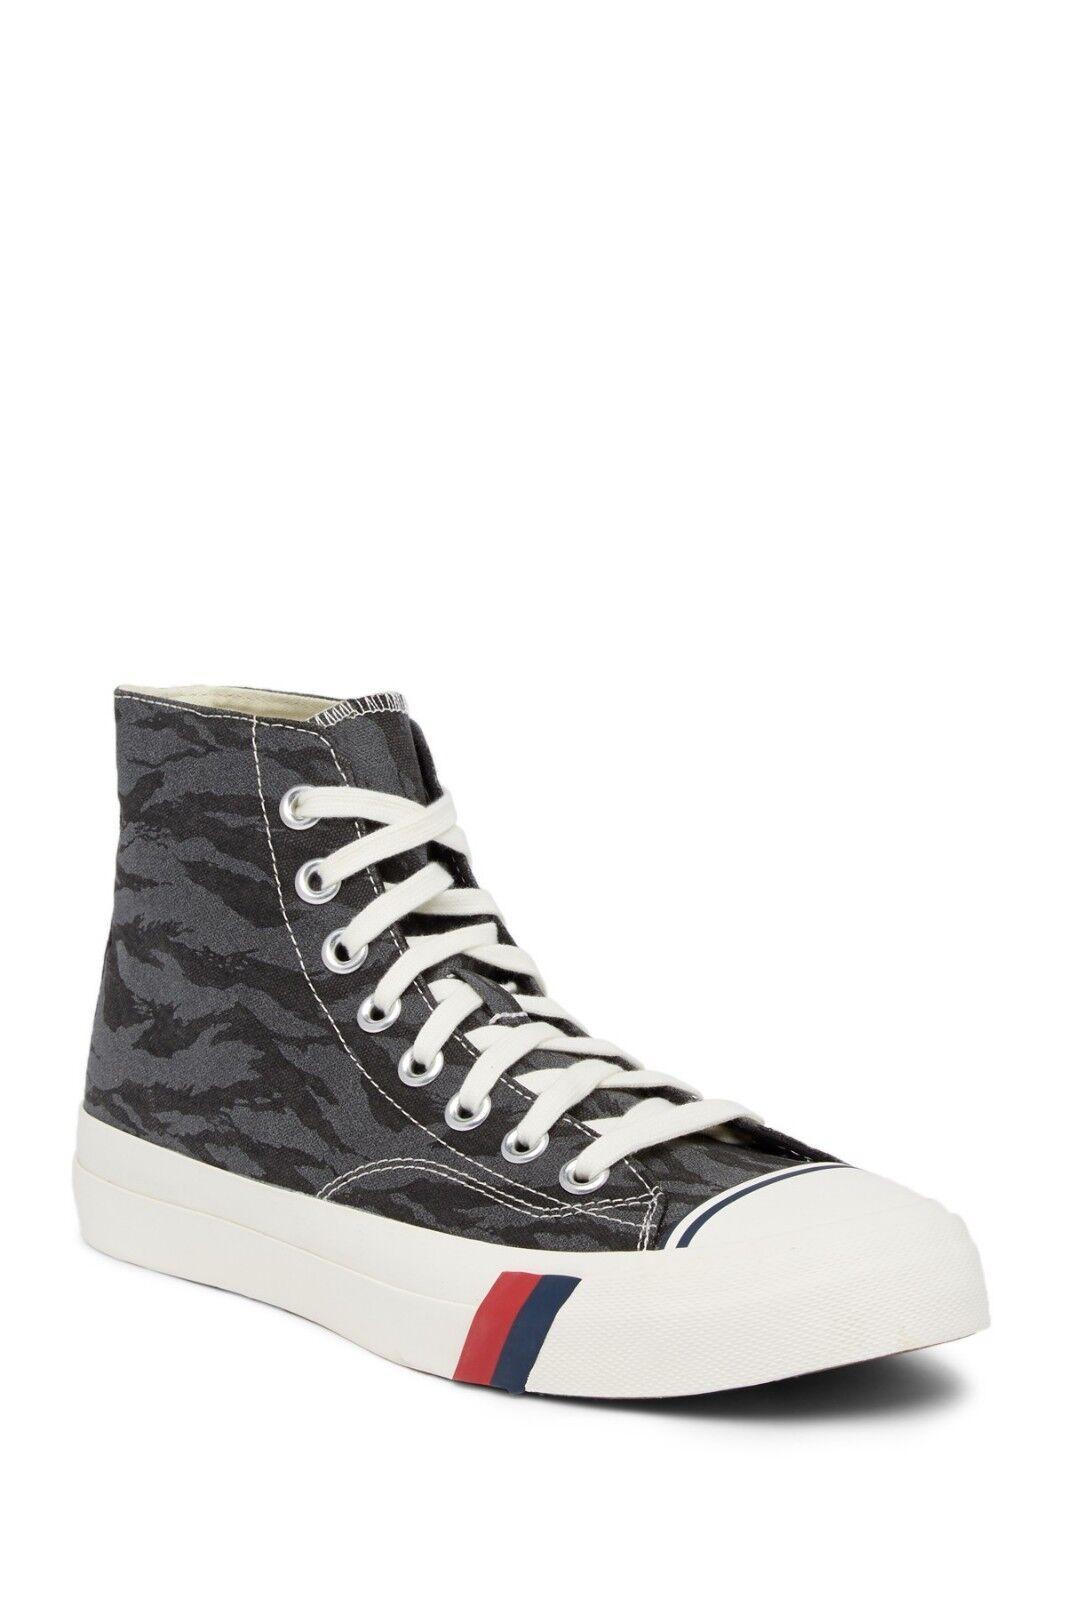 New Keds Royal Hi-Top Tiger Print Sneakers men's shoes